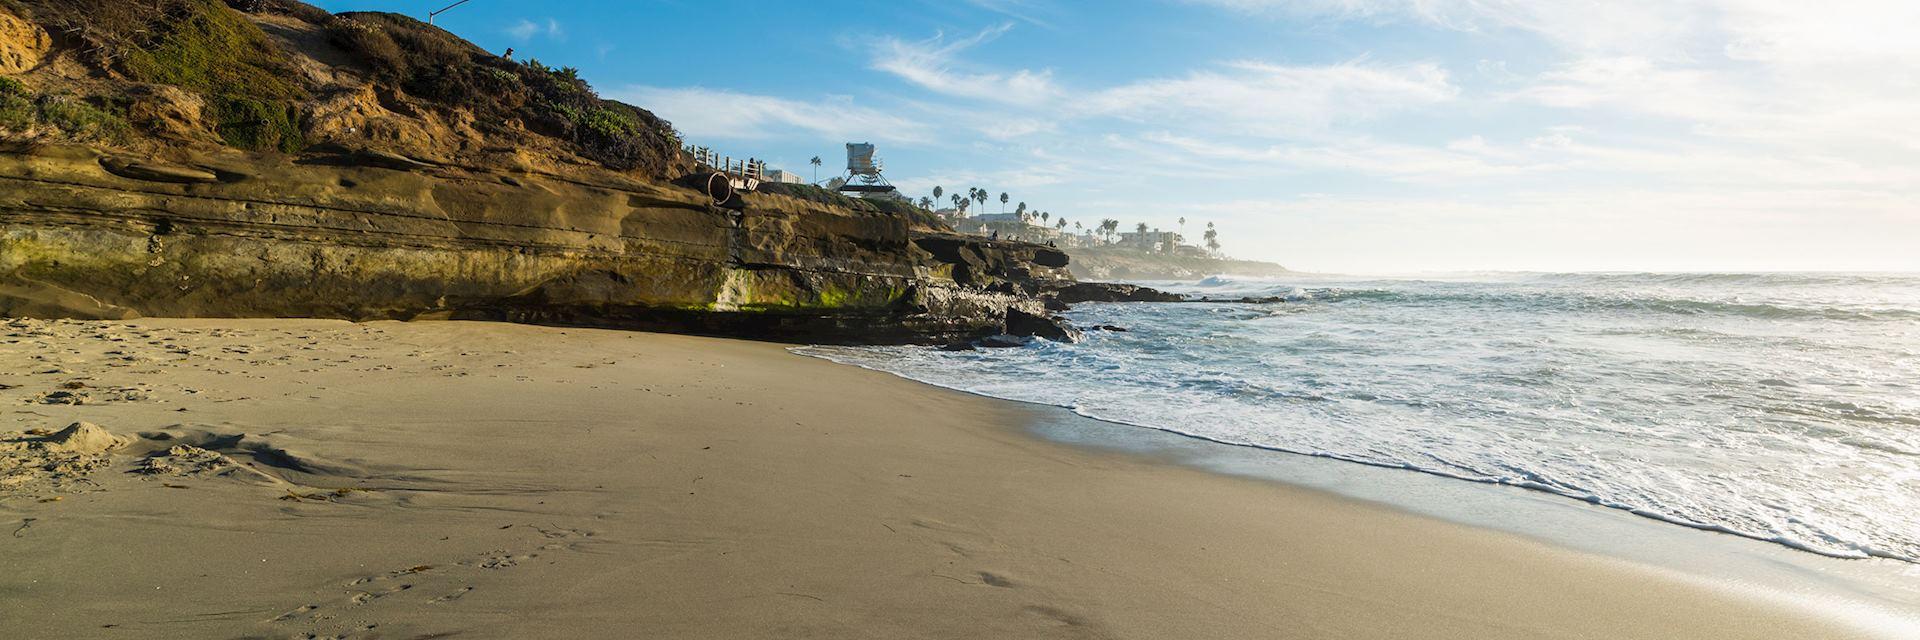 La Jolla beach, San Diego, USA